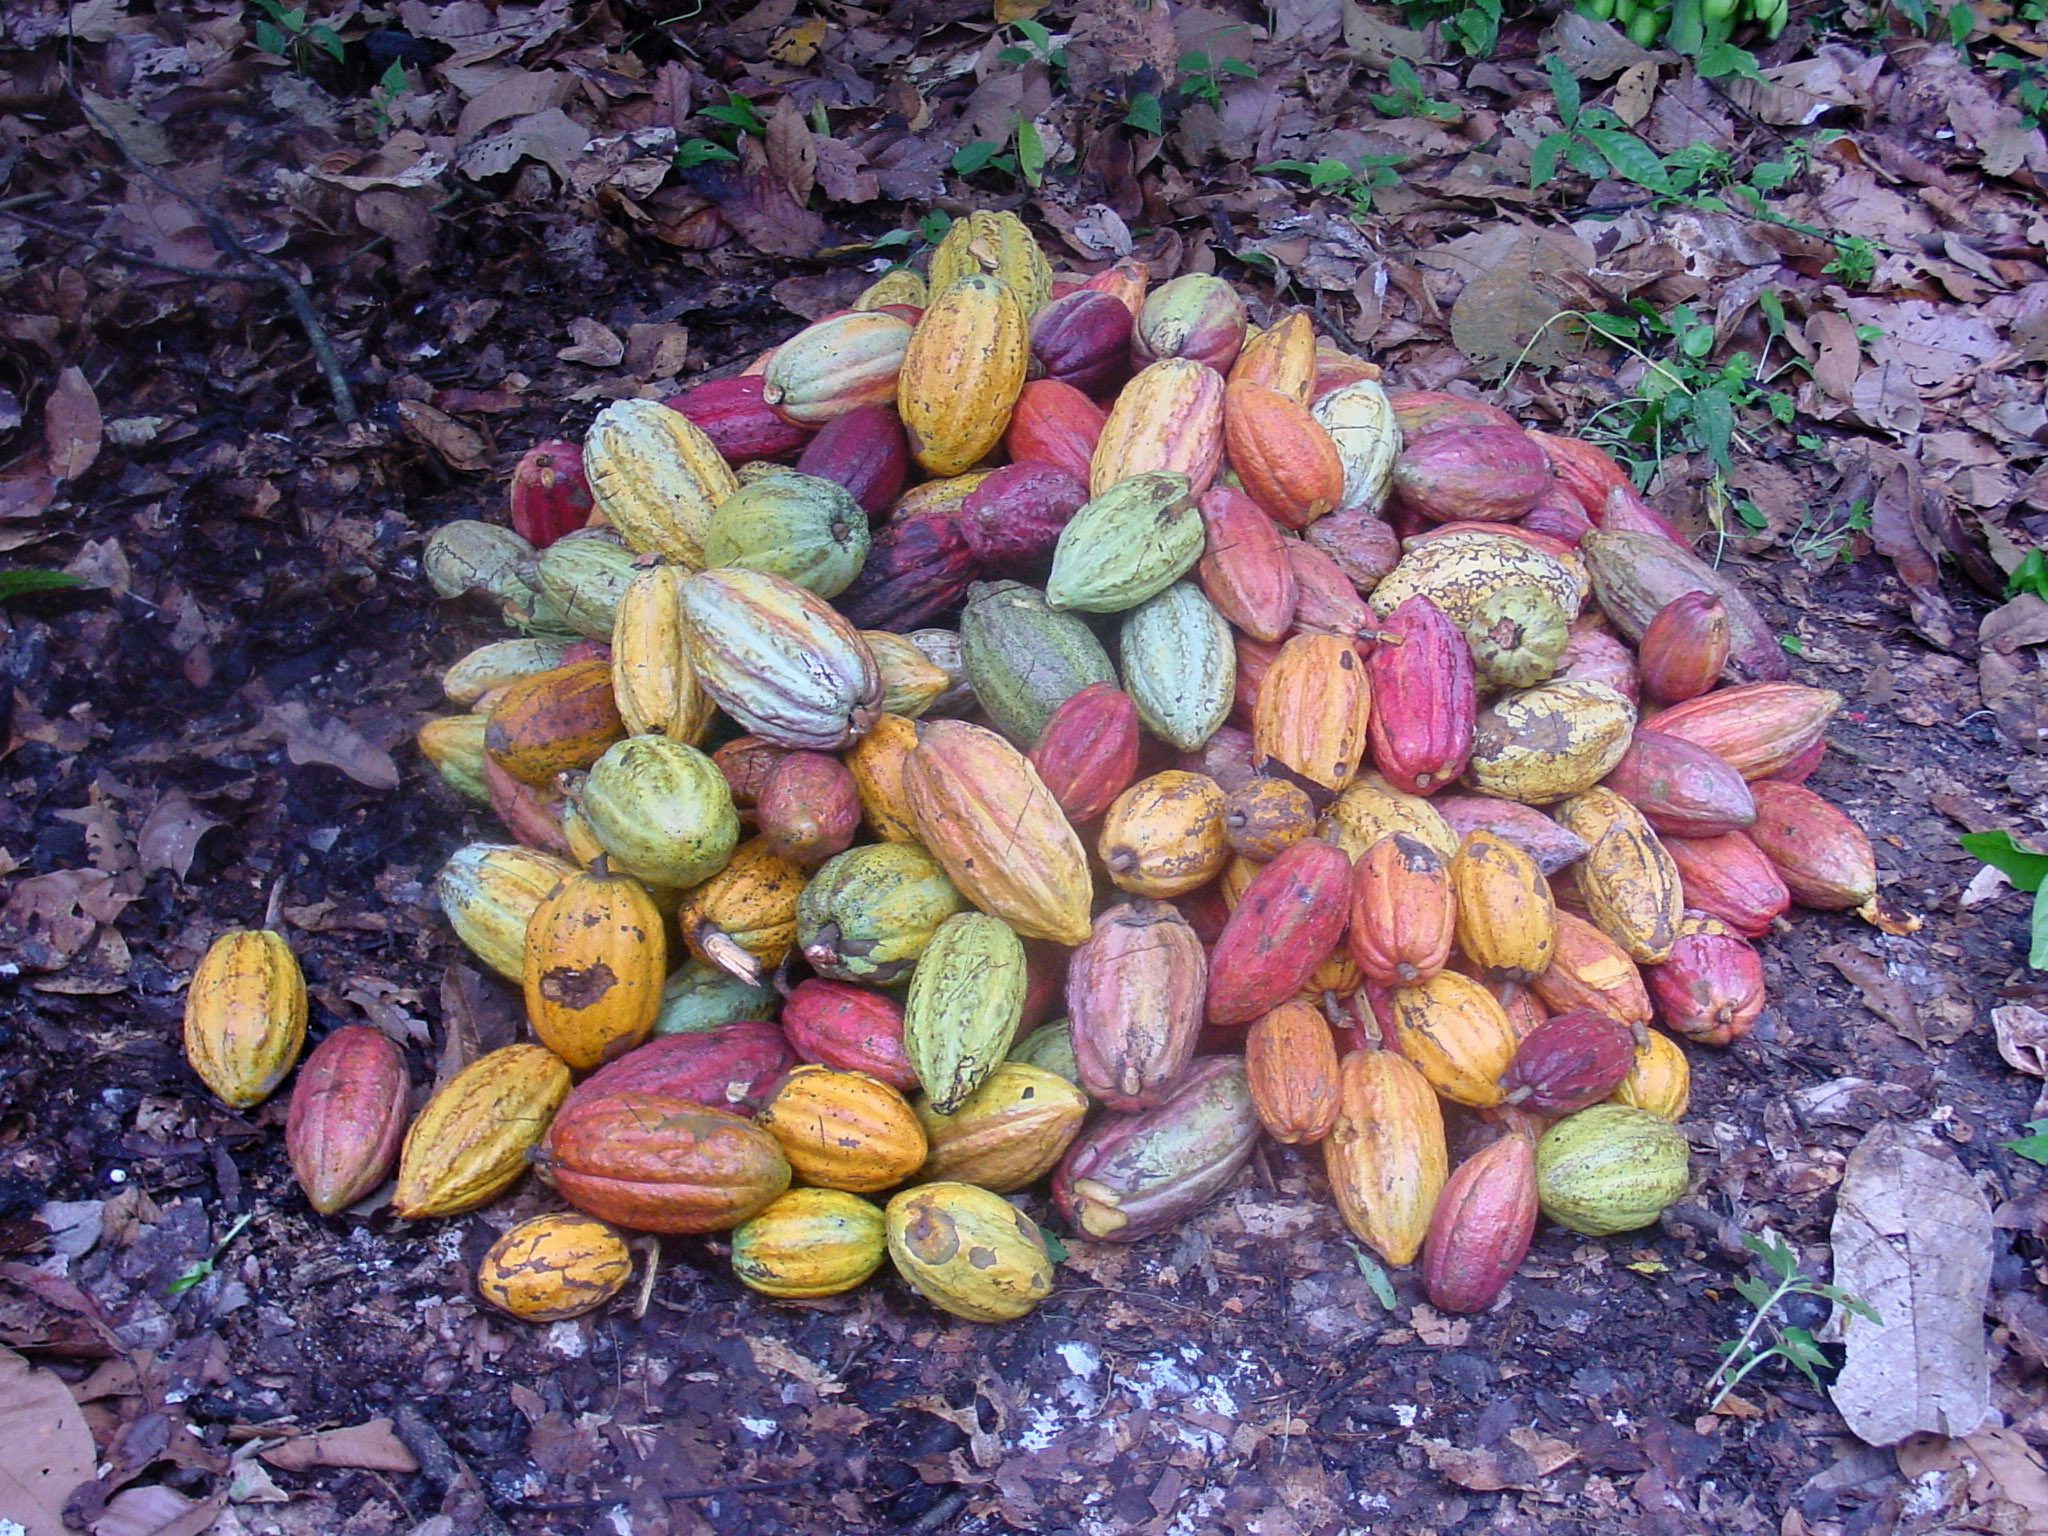 Chocolate Tasting Program – December 3, 2107 at 4:00pm